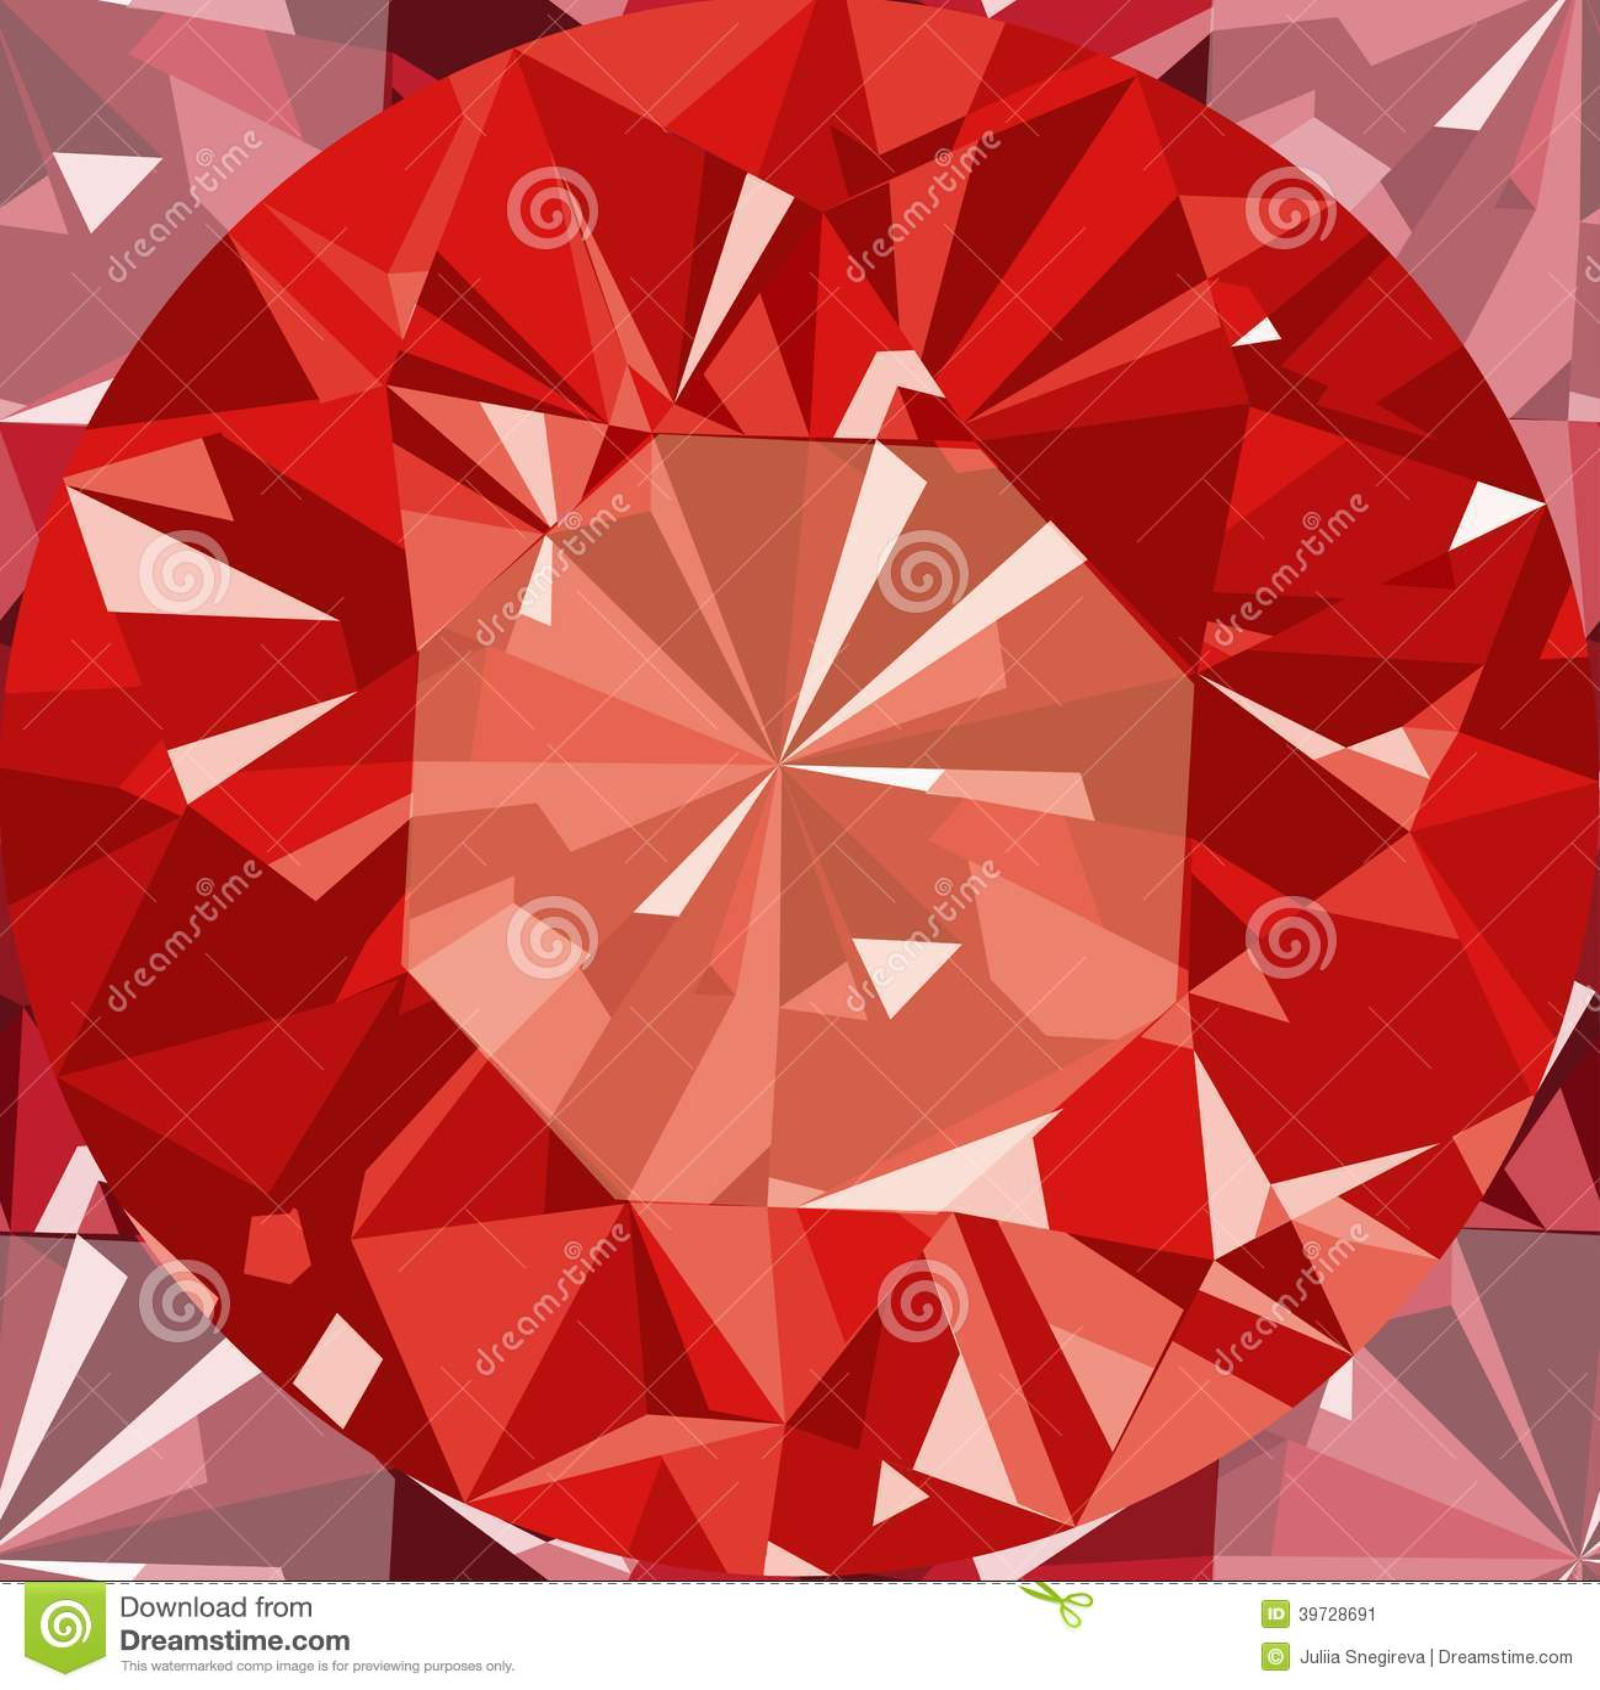 Ruby Design Patterns Magnificent Design Ideas